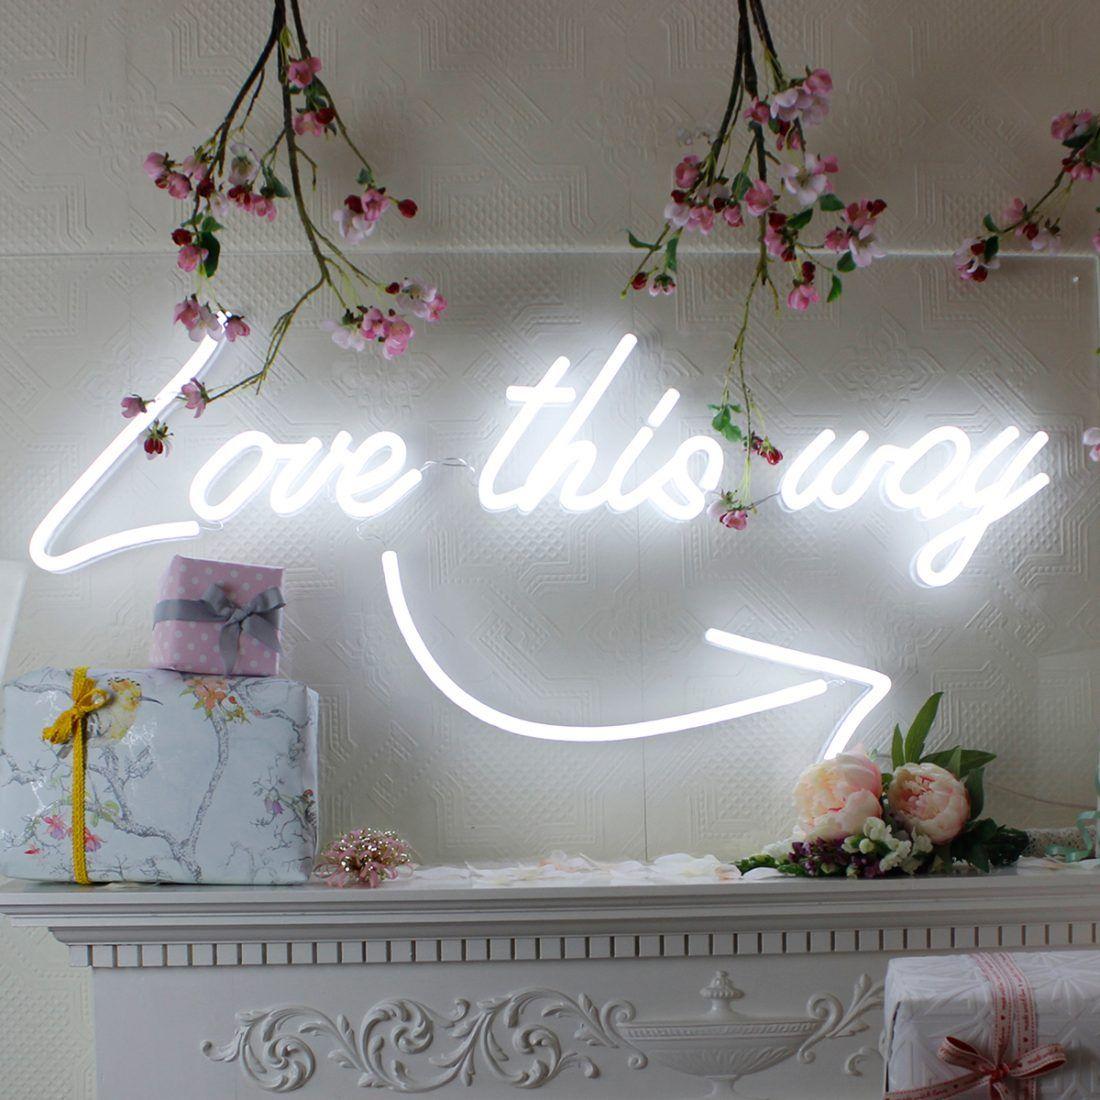 Buying & Hiring Neon Lights for your Wedding Neon